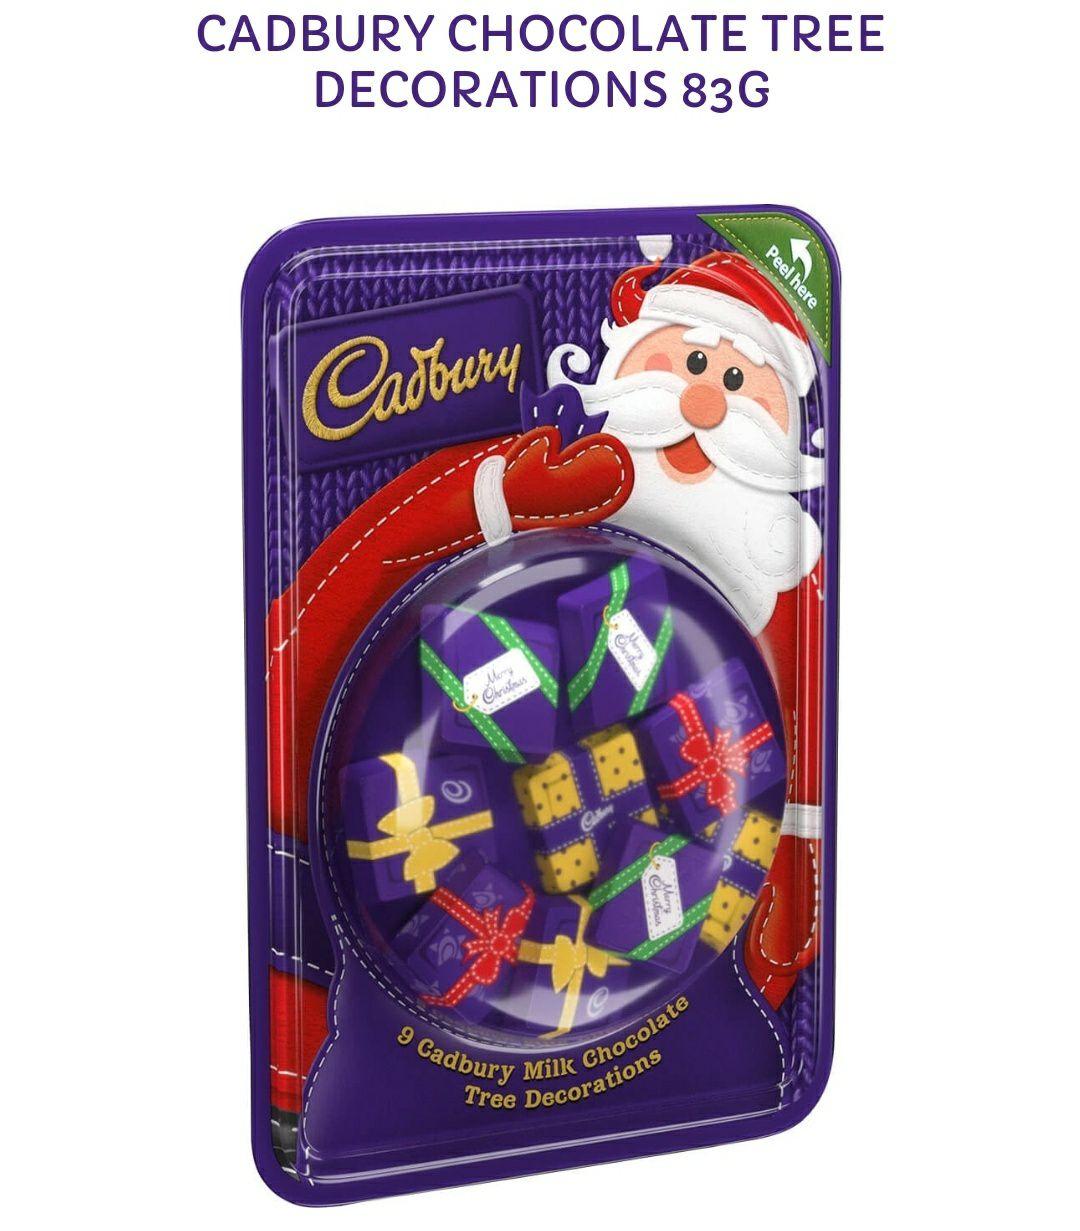 Cadburys Christmas Tree decoration chocolates 83g - 10p Instore @ B&M